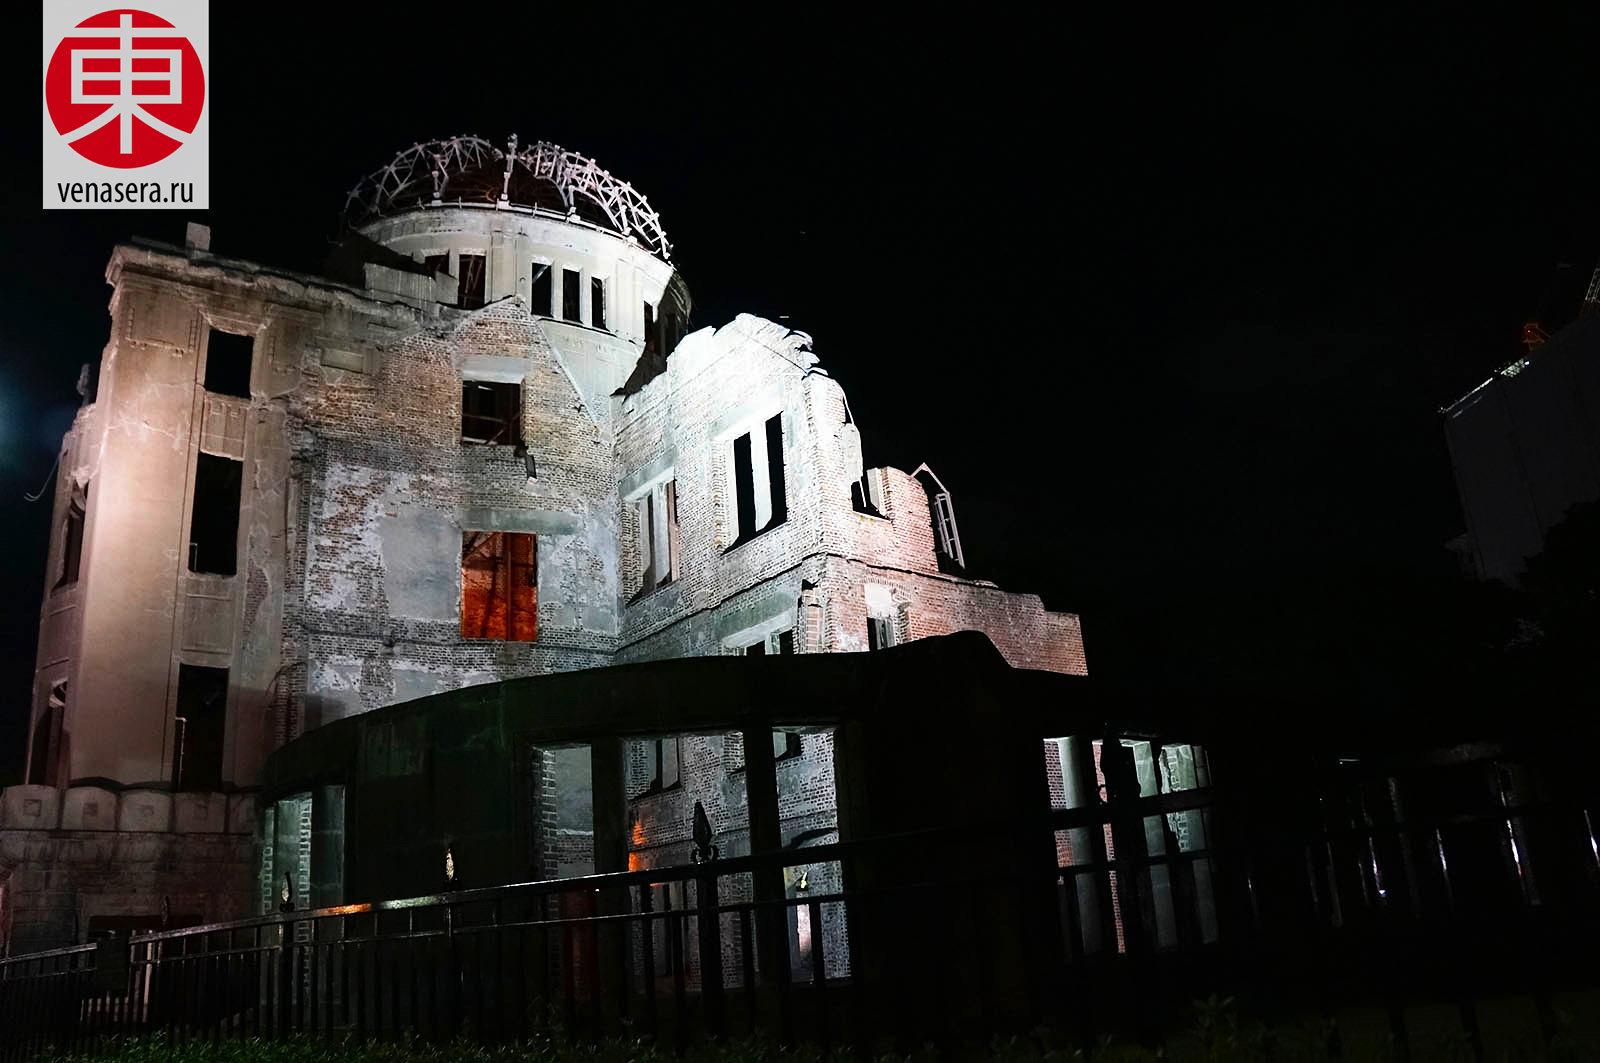 Купол атомного взрыва, Купол Гэмбаку, Атомный купол, Bomb Dome, 原爆ドーム, Хиросима, Hiroshima, 広島, Хонсю, Honshu, 本州, Япония, Japan, 日本.